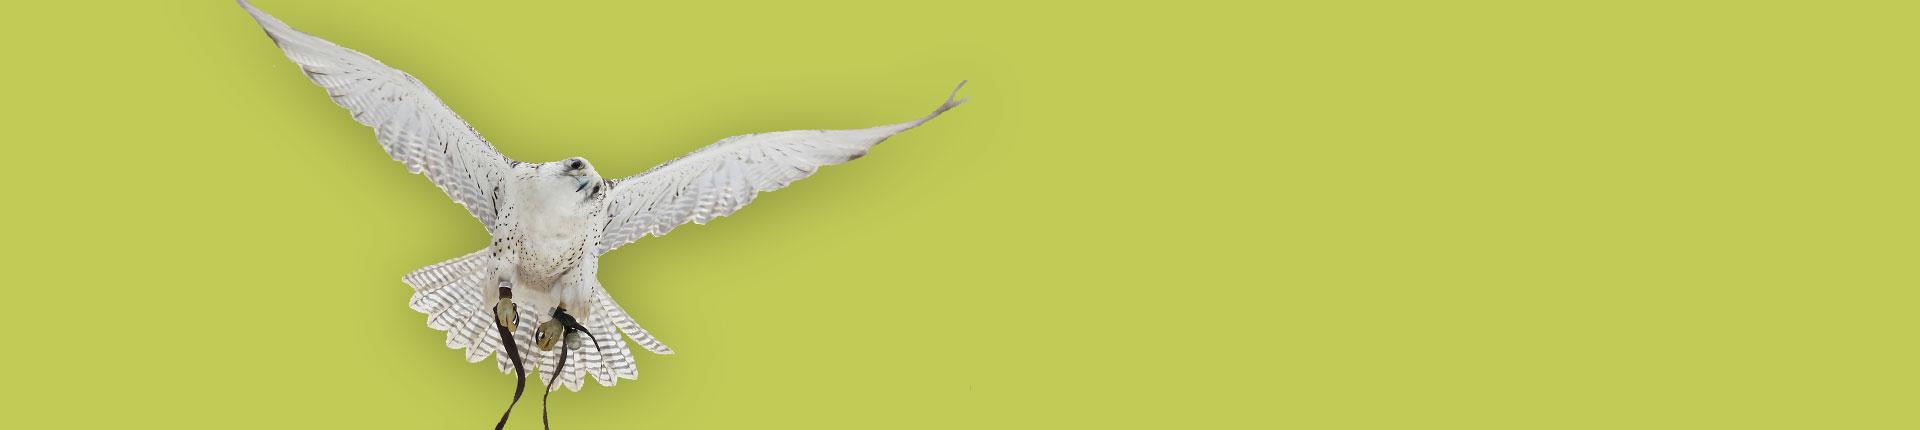 Falknervorführung